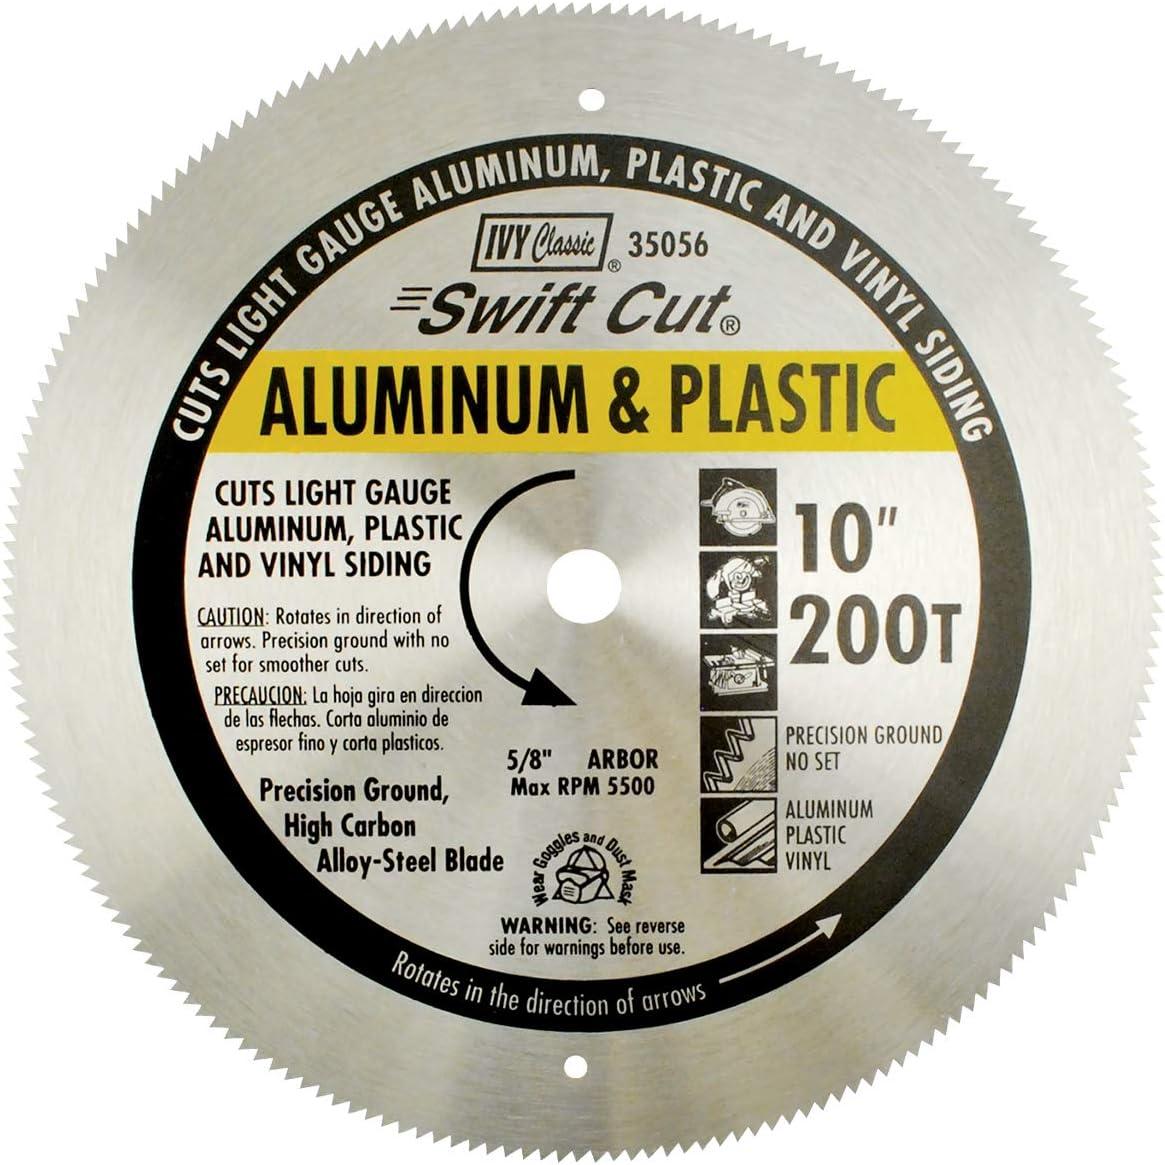 IVY Classic 10-Inch Circular Saw Blade